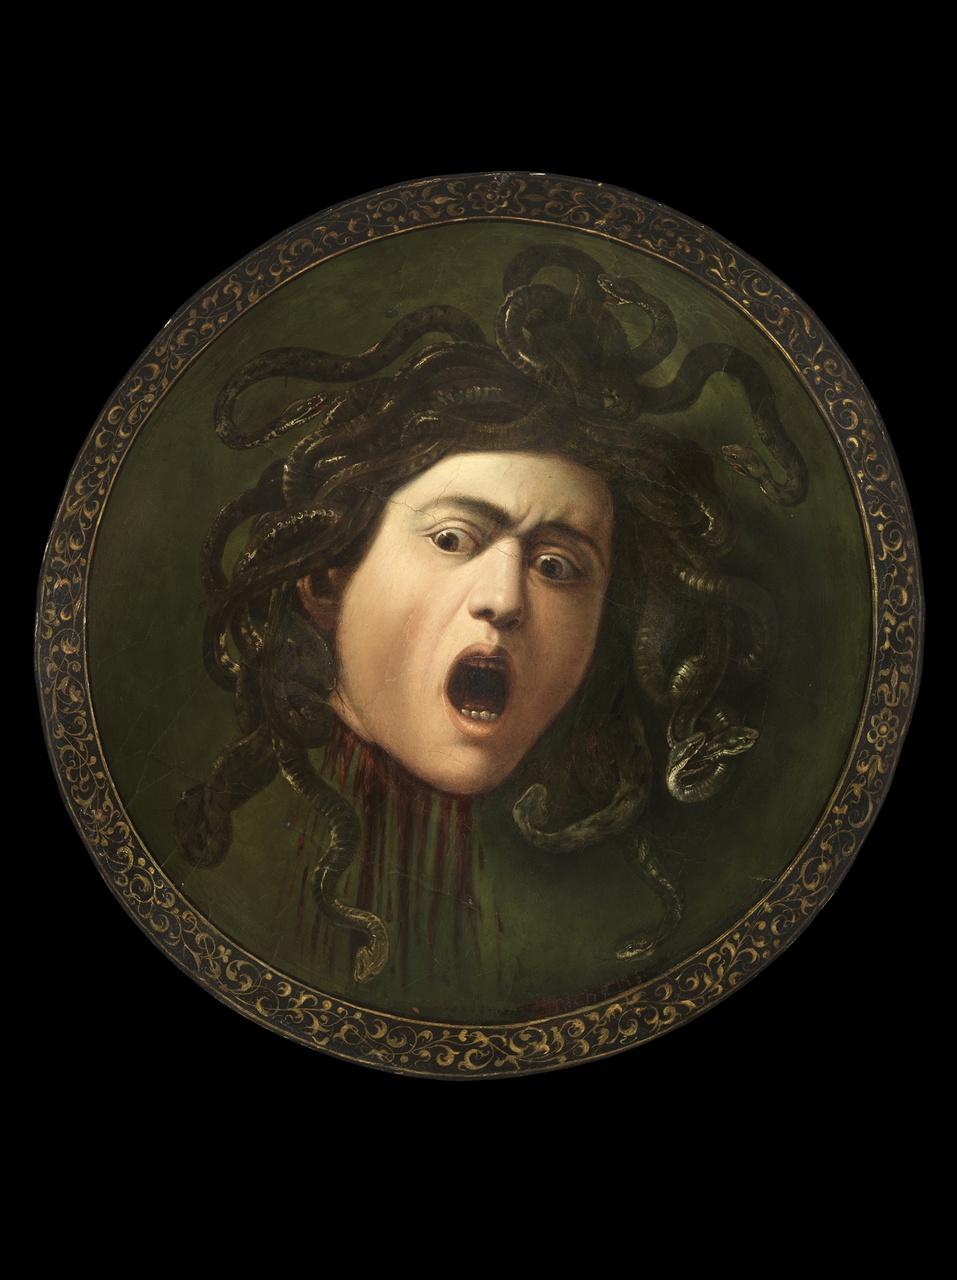 5/34 - Caravaggio, Medusa, ca.1596. Bruikleen particuliere collectie. In de tentoonstelling vanaf 15 januari 2019.